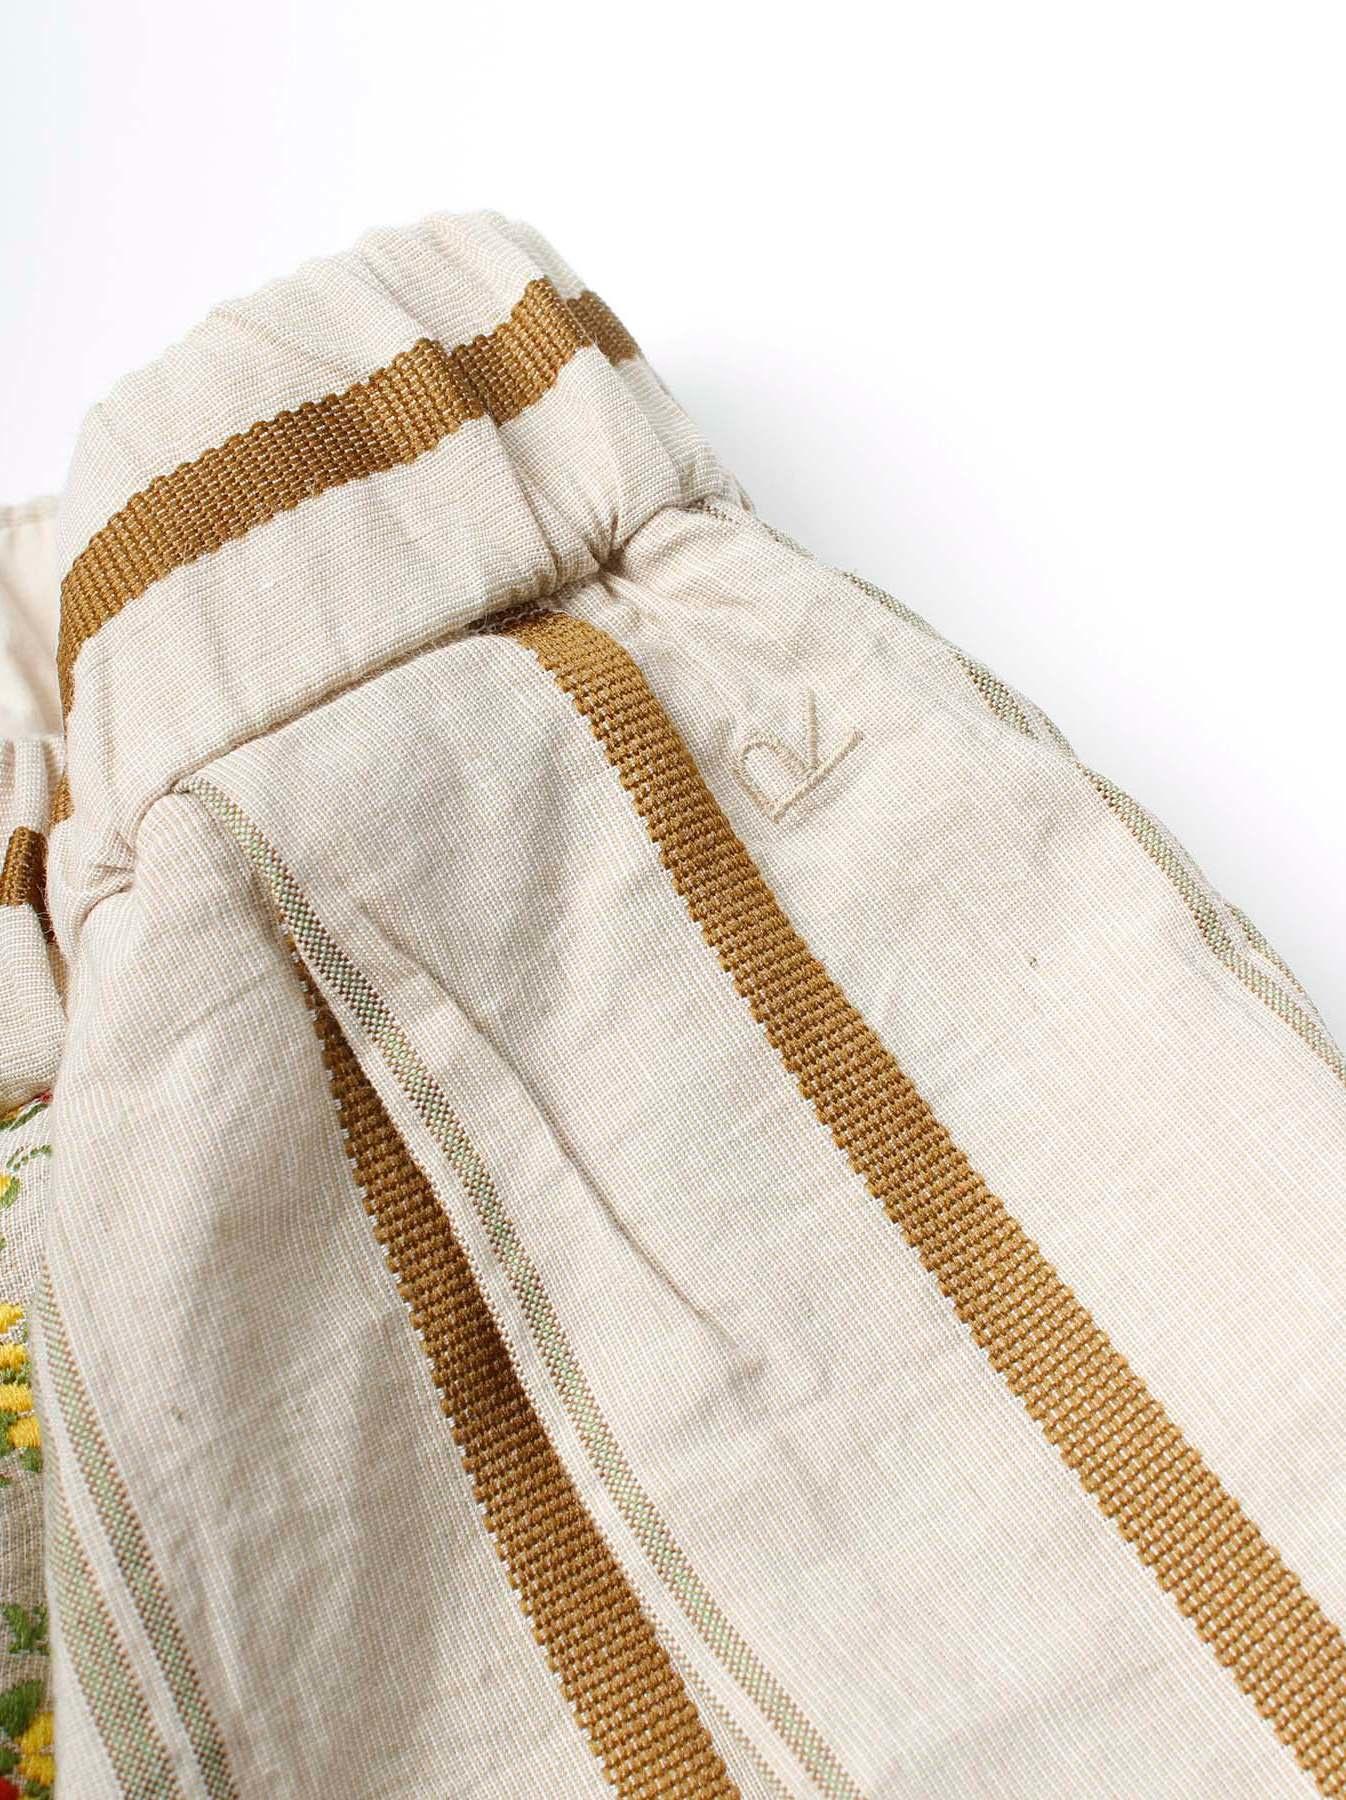 WH Hakeme Flower Jacquard Pants-10